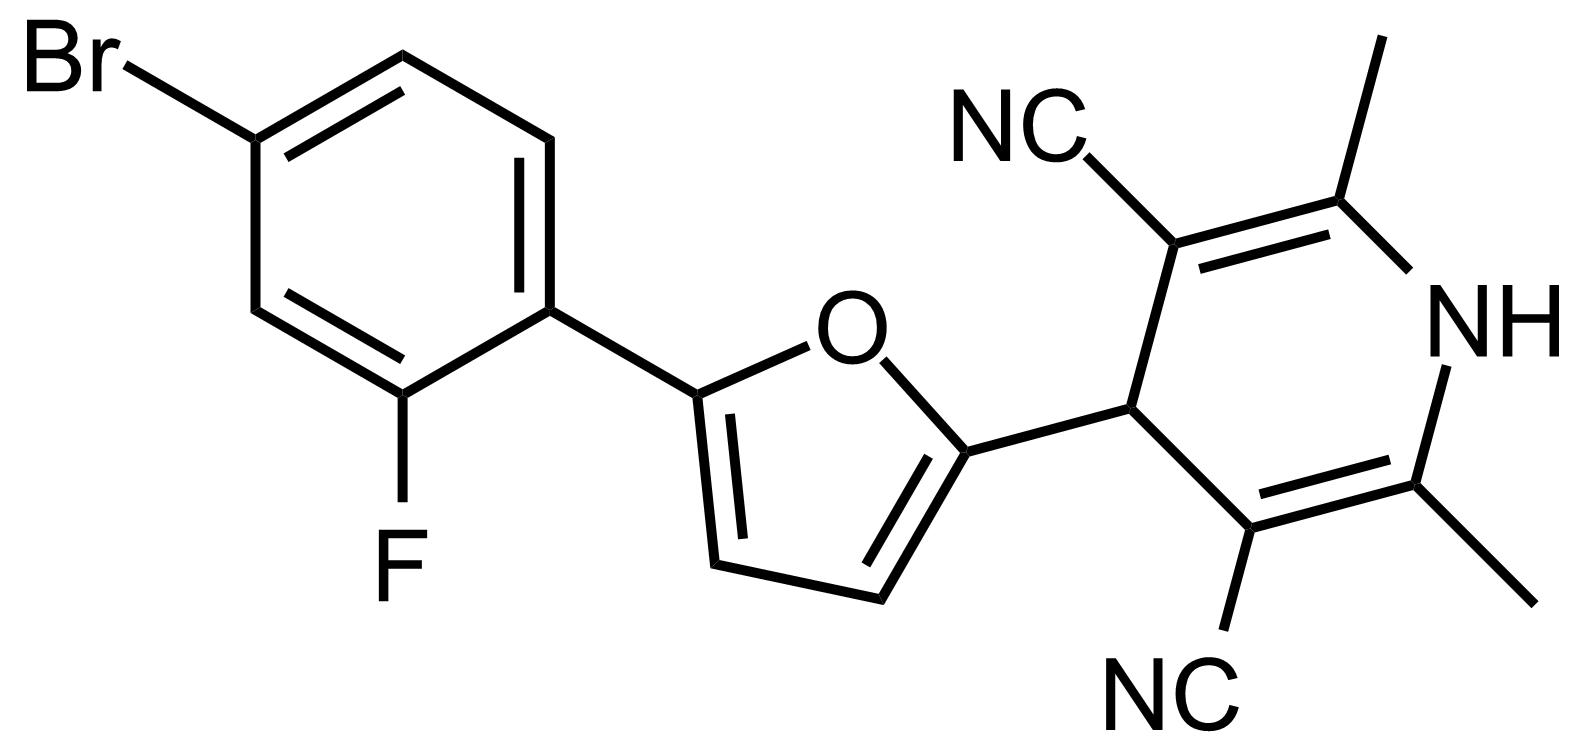 Structure of 4-(5-(4-Bromo-2-fluorophenyl)furan-2-yl)-2,6-dimethyl-1,4-dihydropyridine-3,5-dicarbonitrile